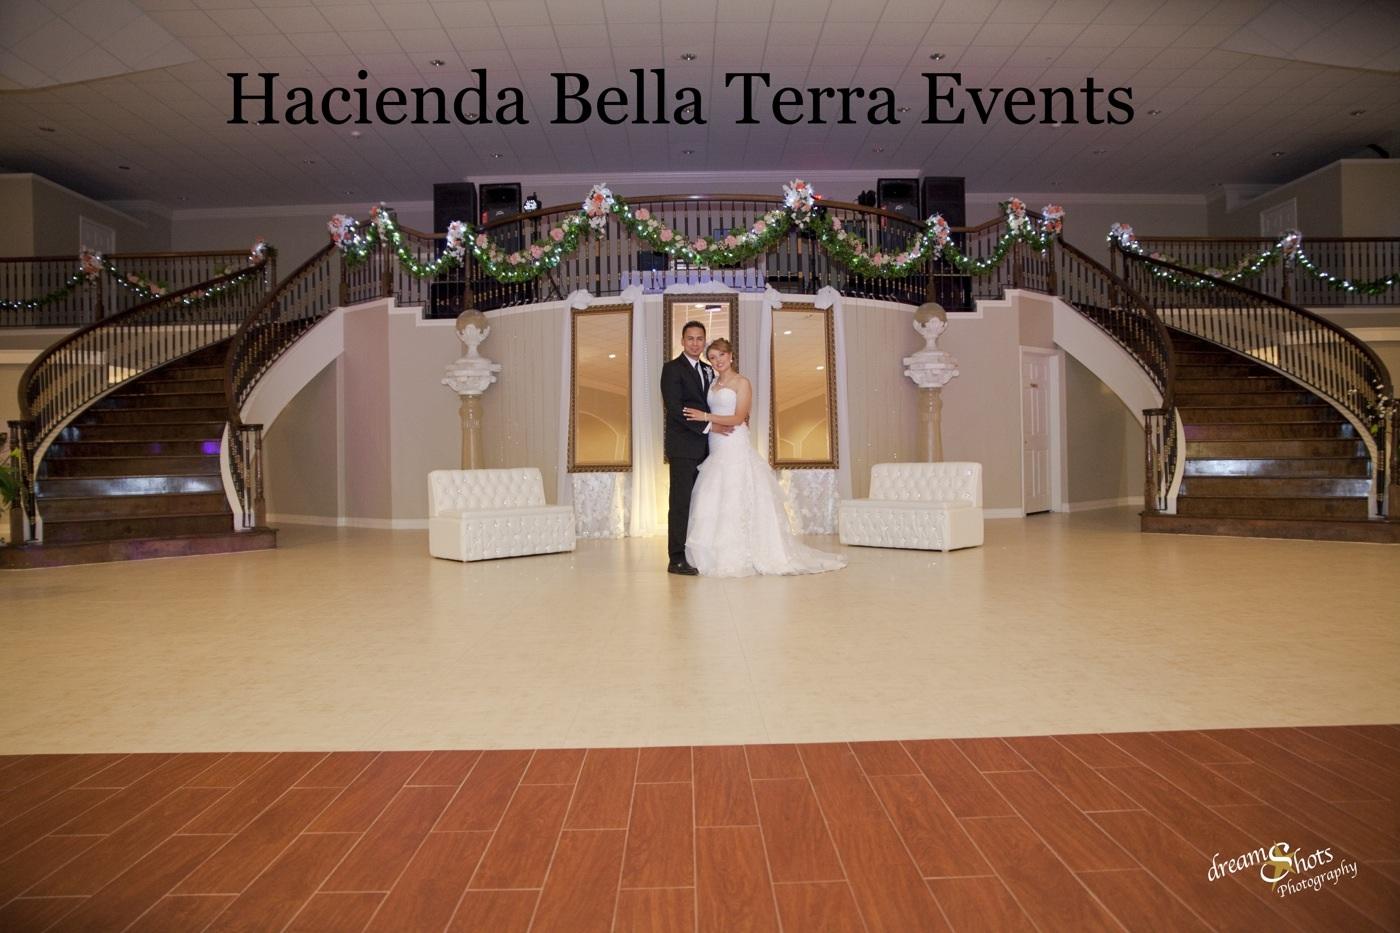 Hacienda Bella Terra